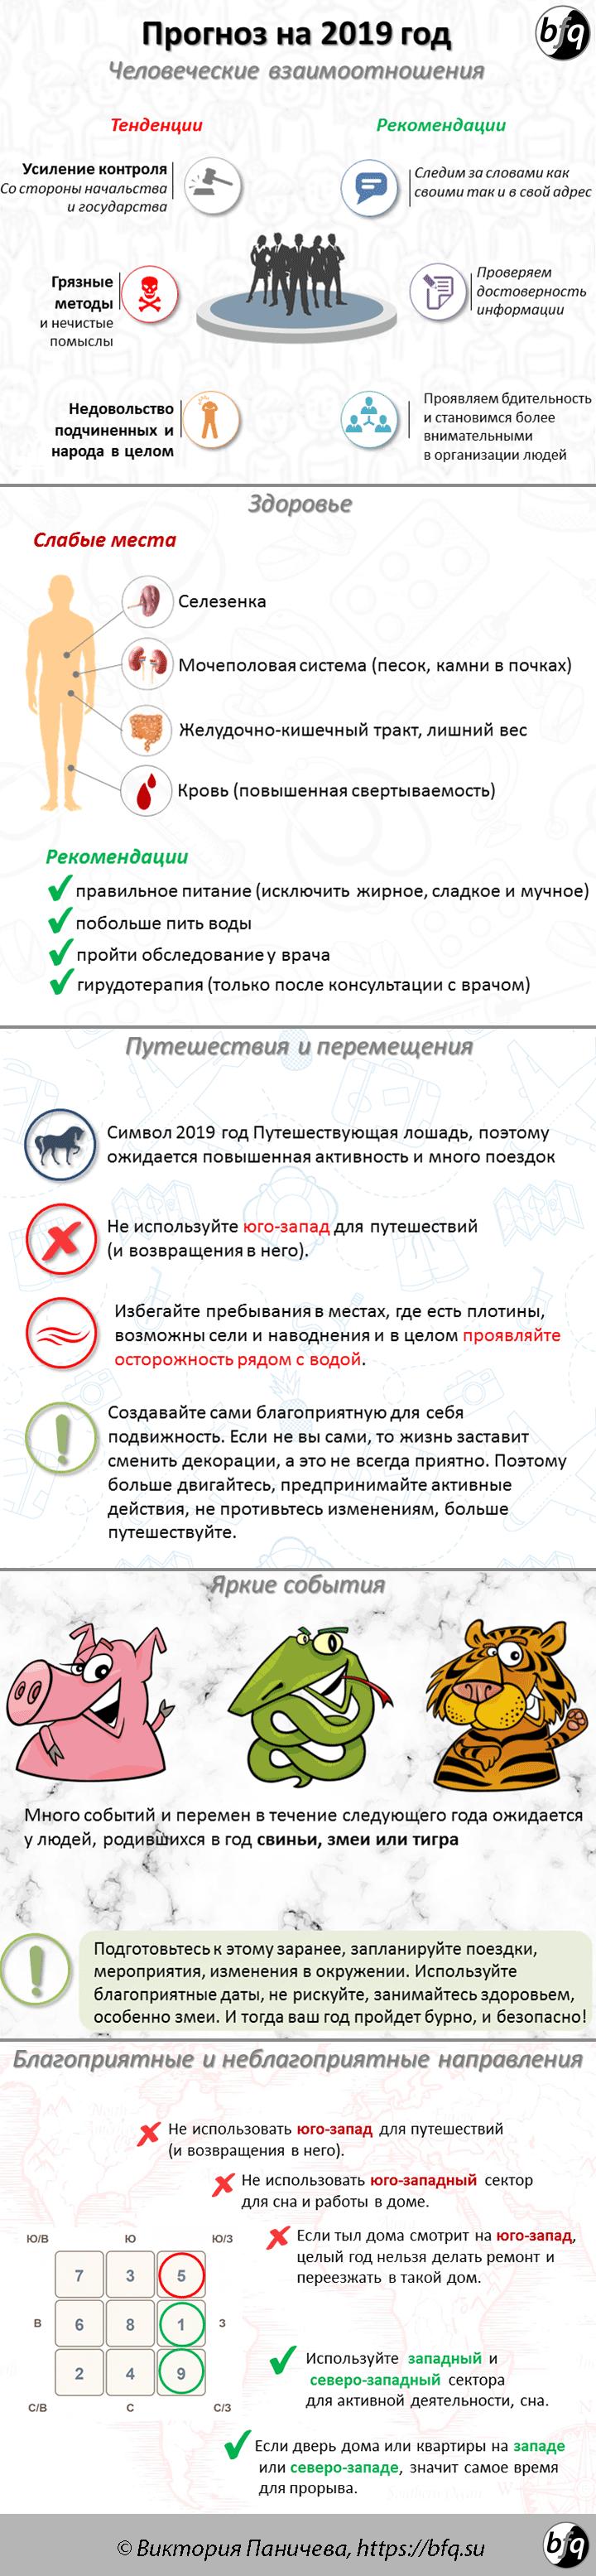 Прогноз на 2019 год